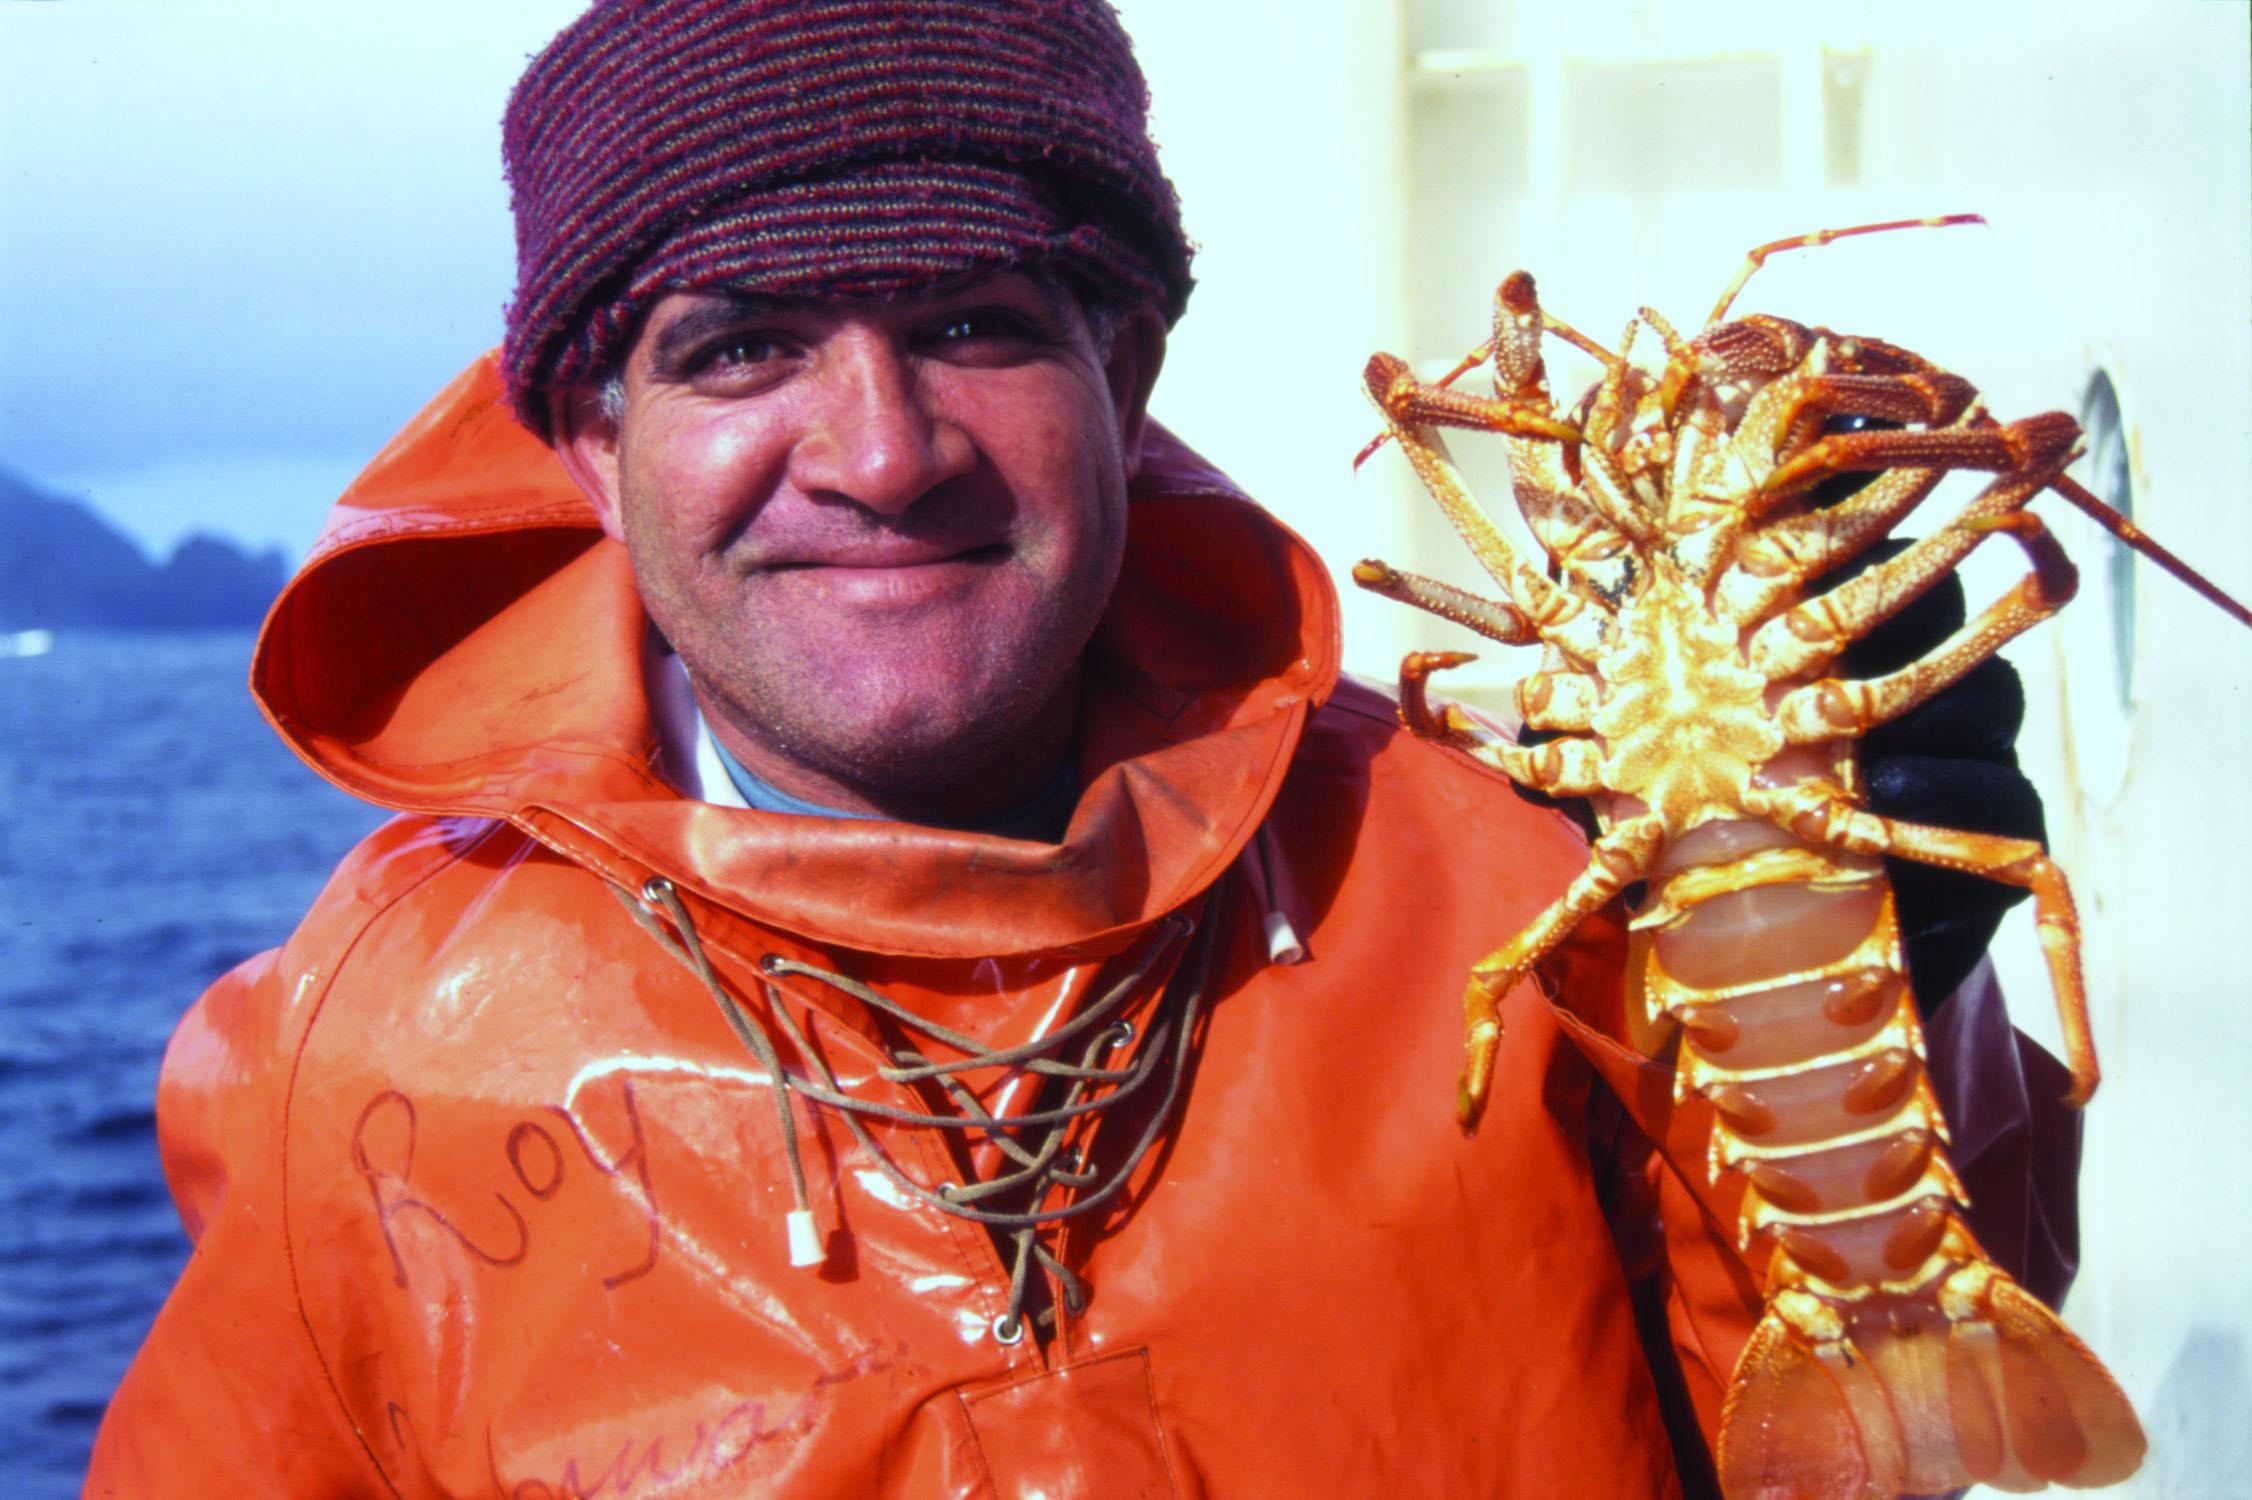 Roy and crayfish (c) Jaco Barendse.jpg